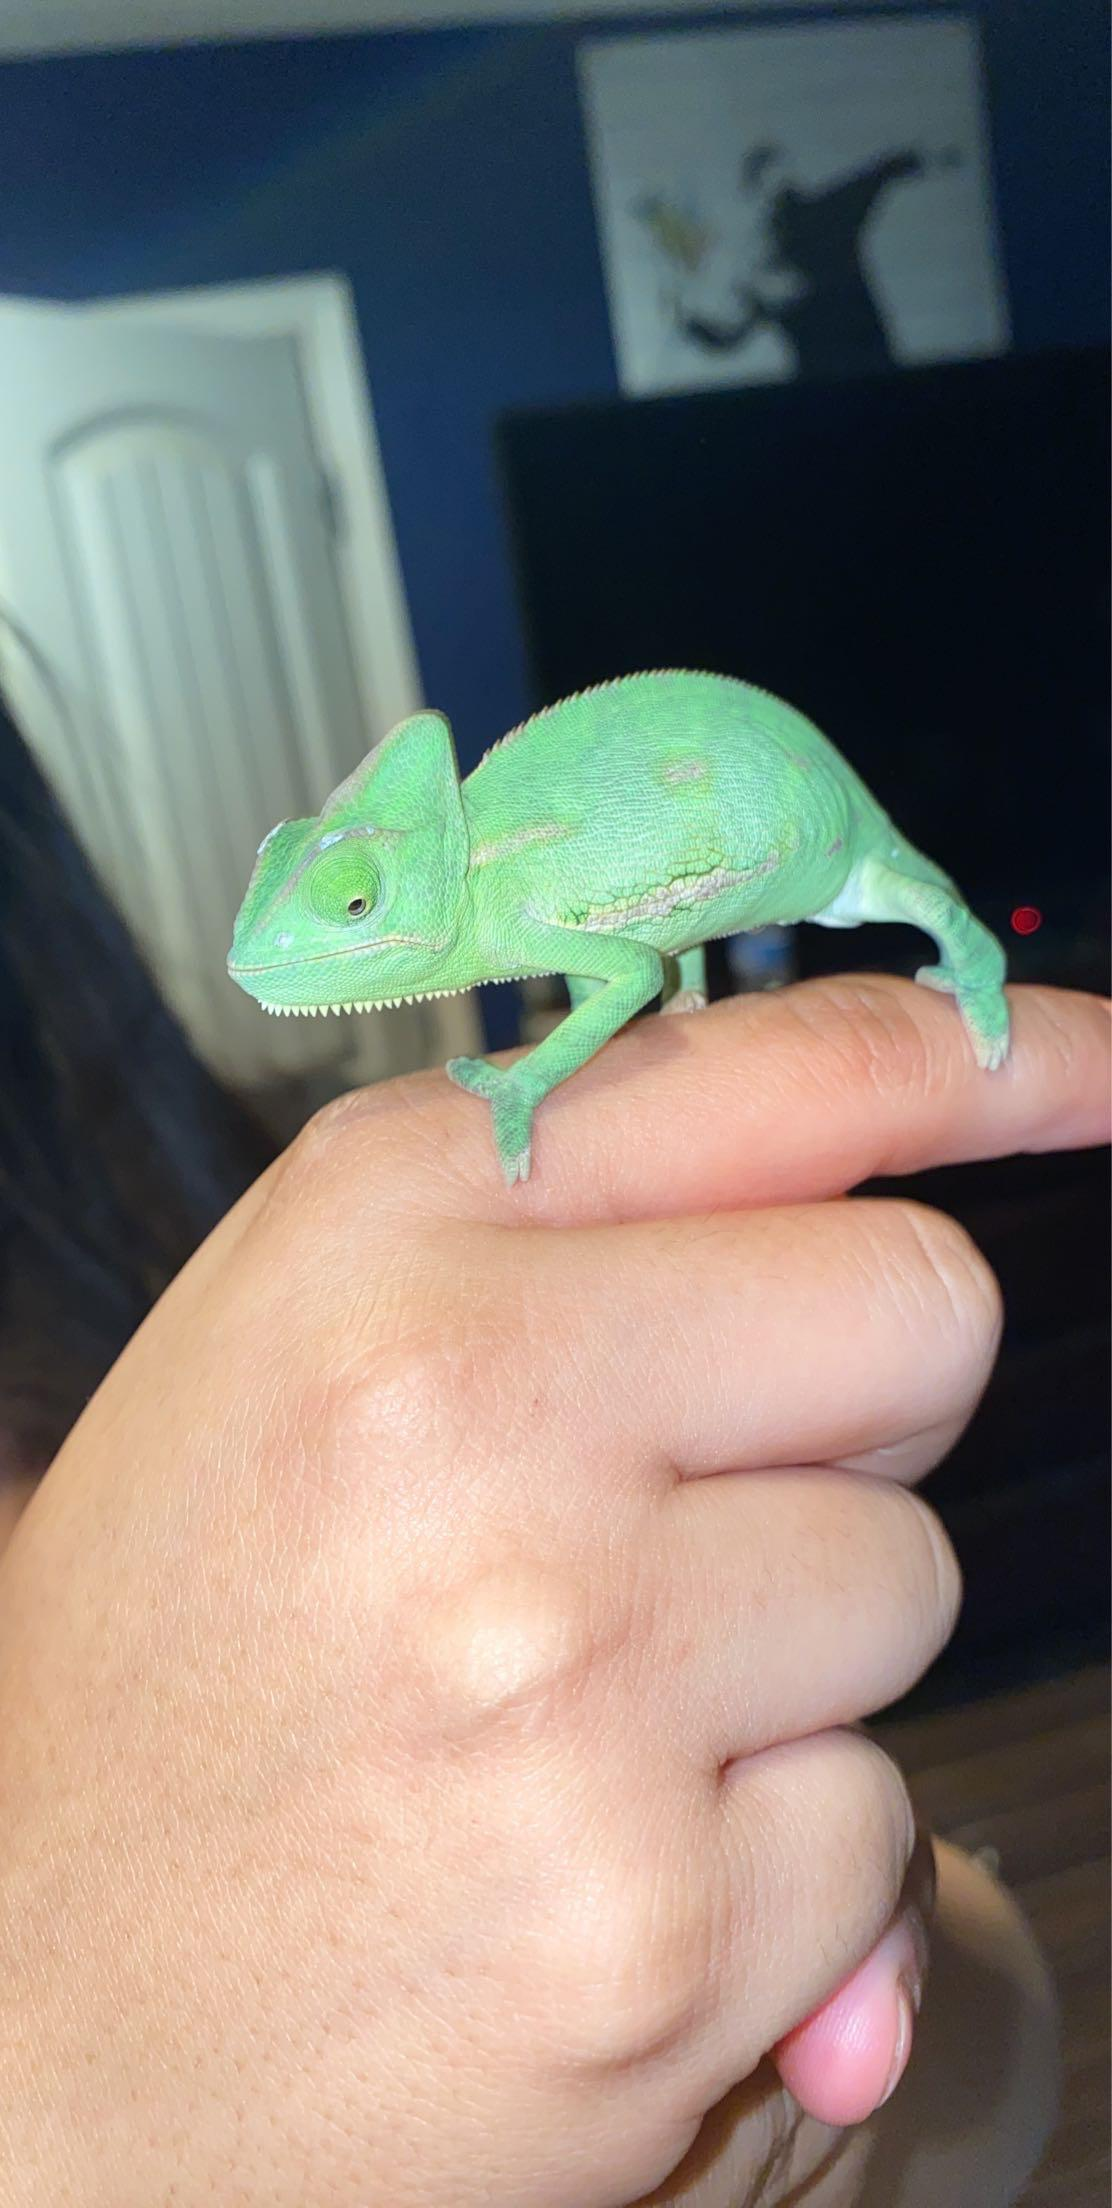 Petsmart Chameleon Cage : petsmart, chameleon, Little, Nagini,, Unfortunately, Bought, PetSmart, Husband, Better., Suggestions/, Advice, Greatly, Appreciate!, First, Chameleon, Owners!, Chameleons